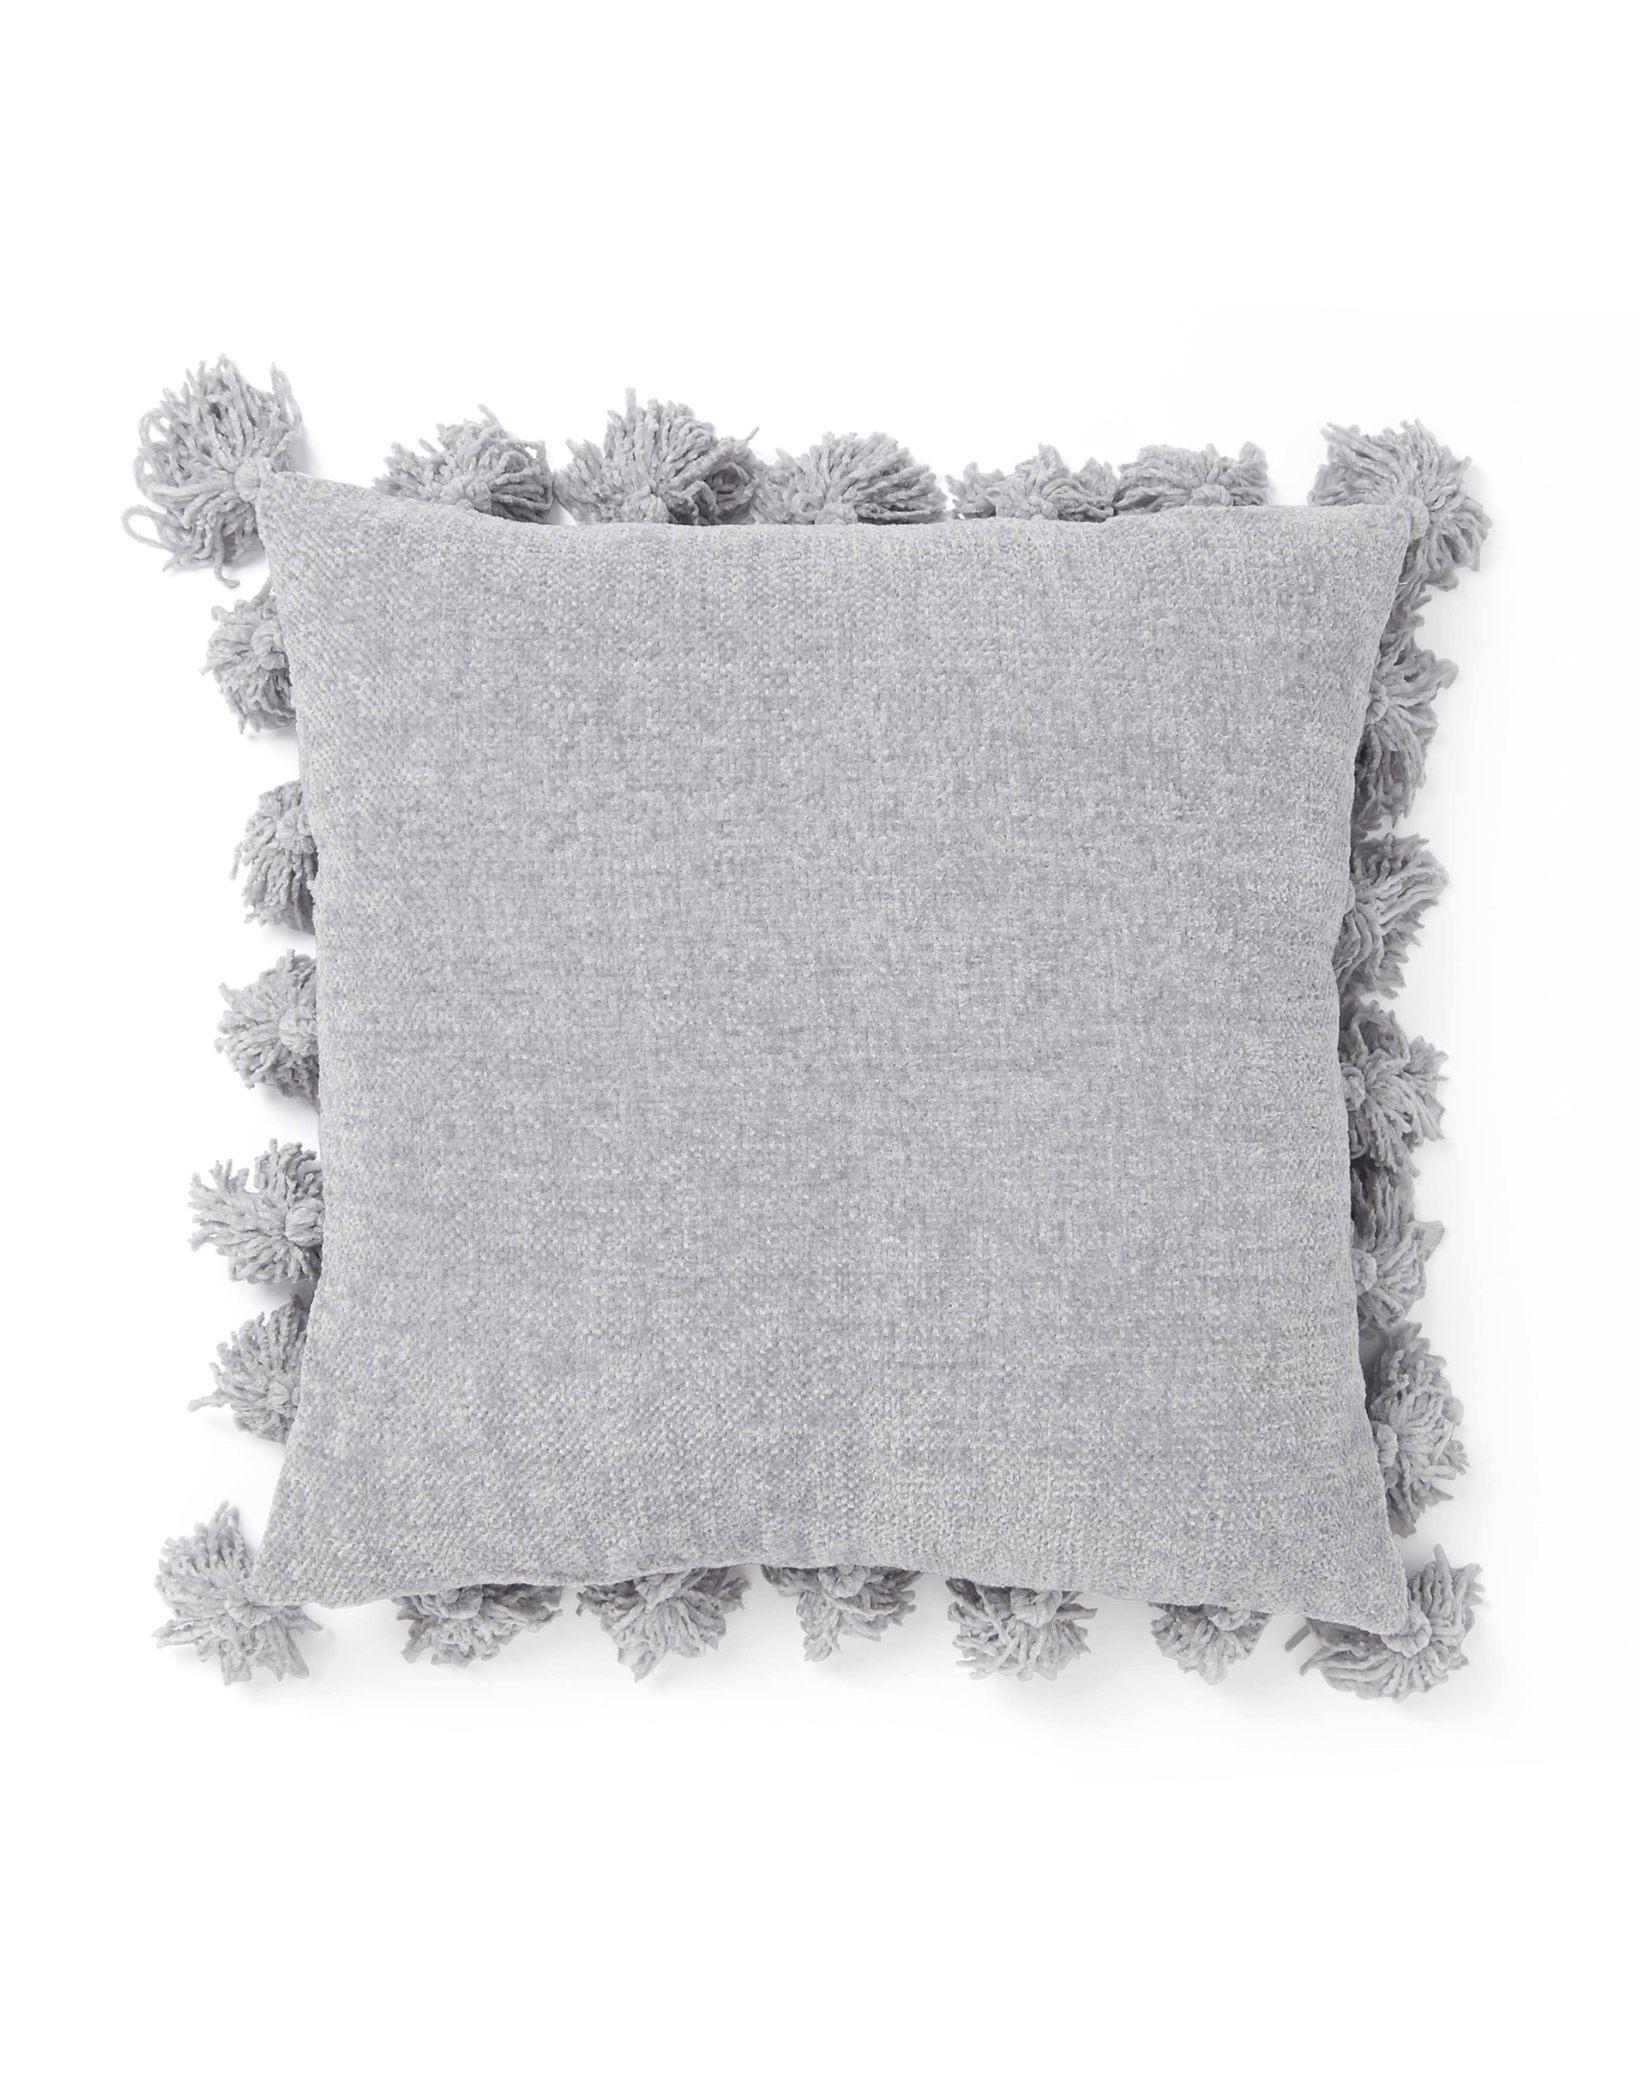 Dormify Chenille Knit Tassel Pillow